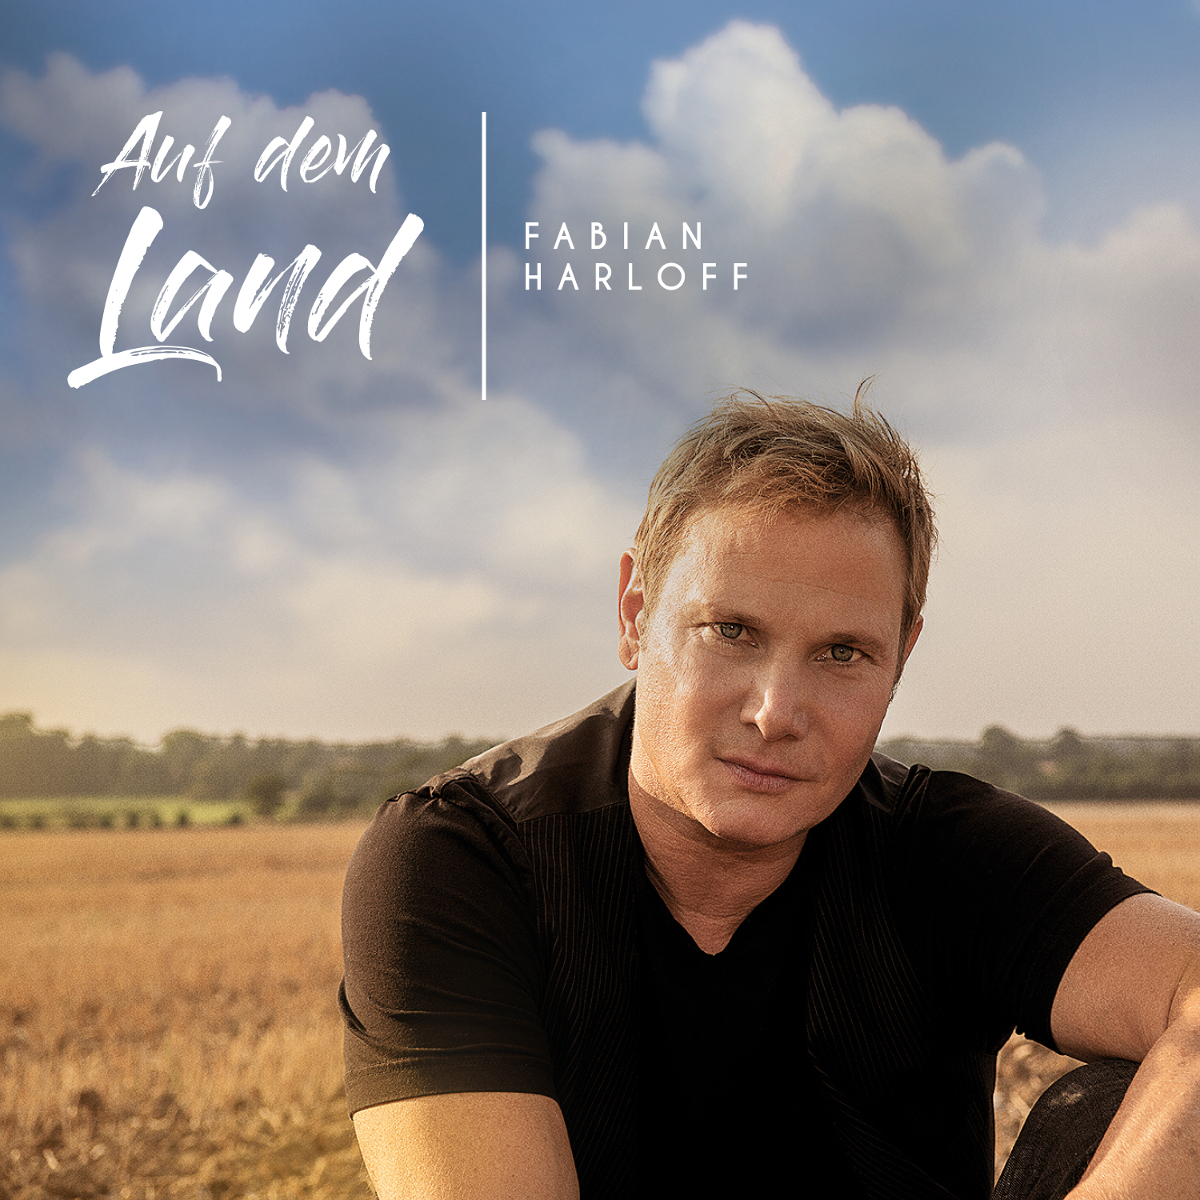 FABIAN HARLOFF * Auf dem Land (CD)